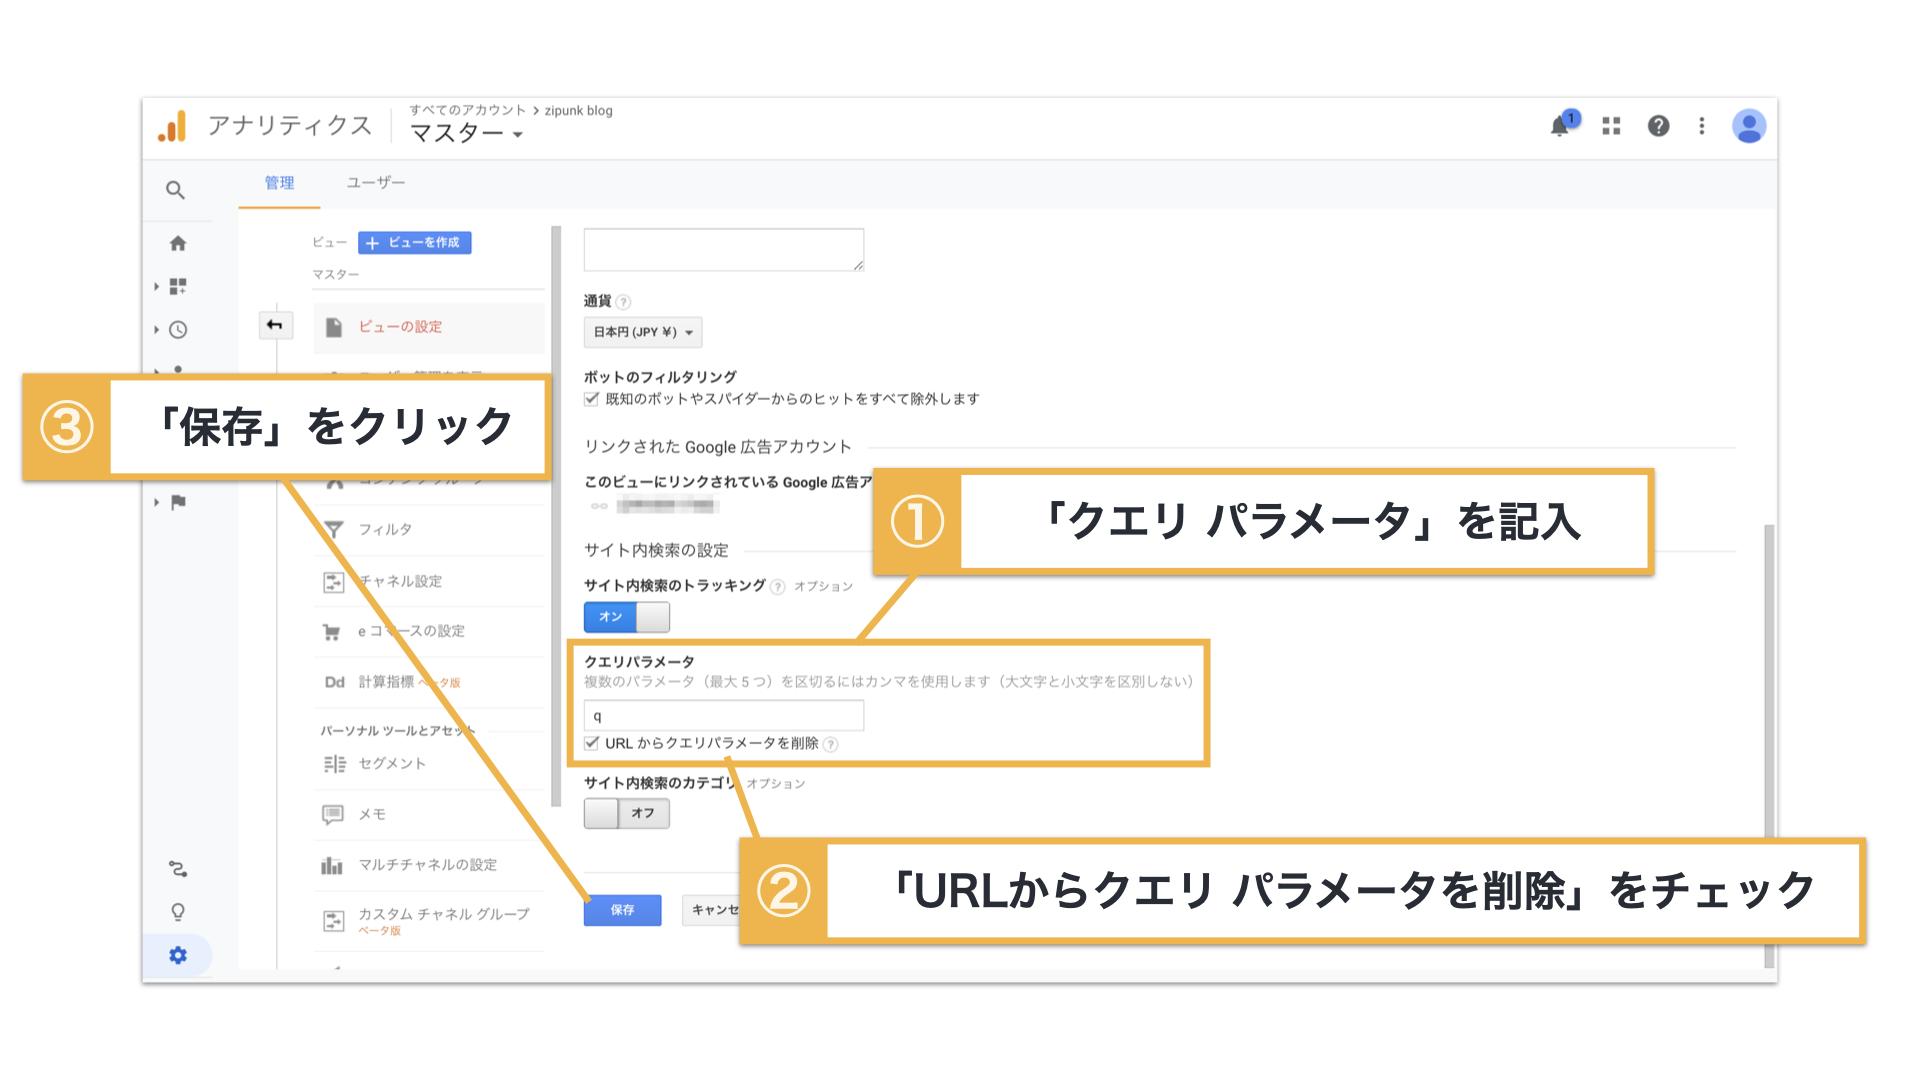 ga-site-search-setting-2